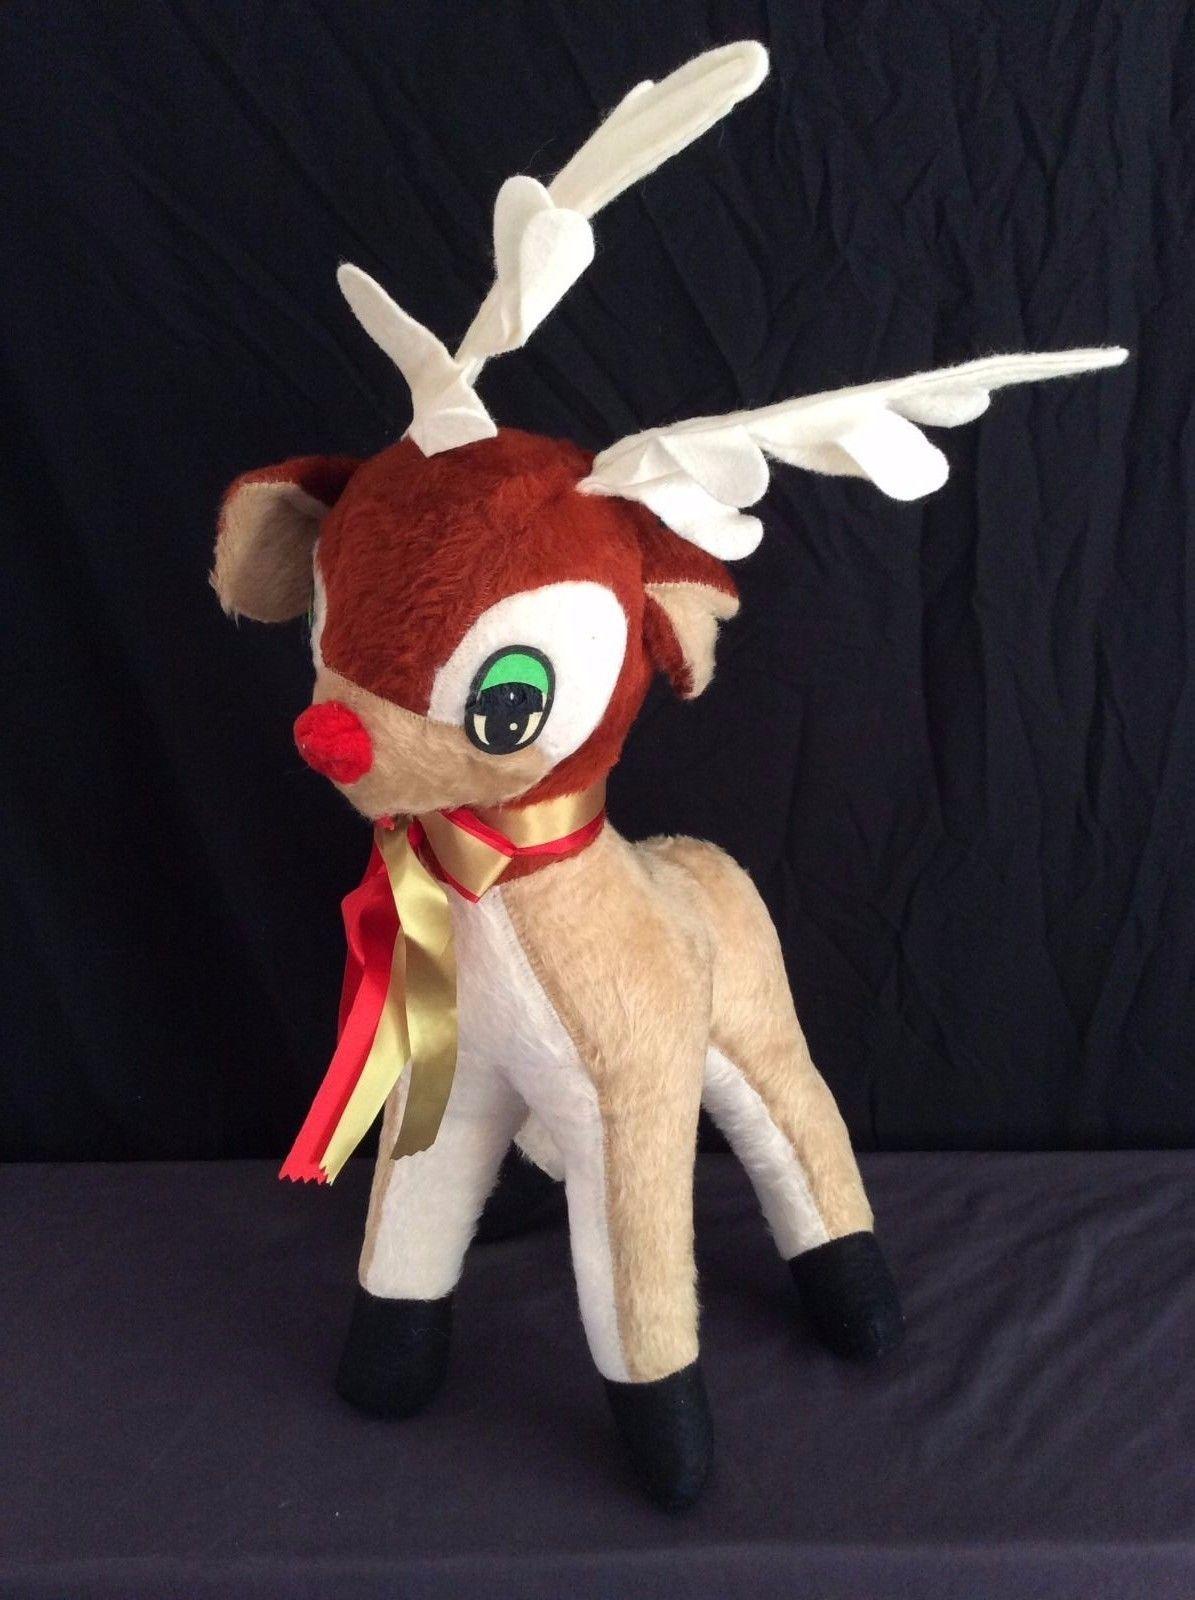 Rudolph the blowjob reindeer